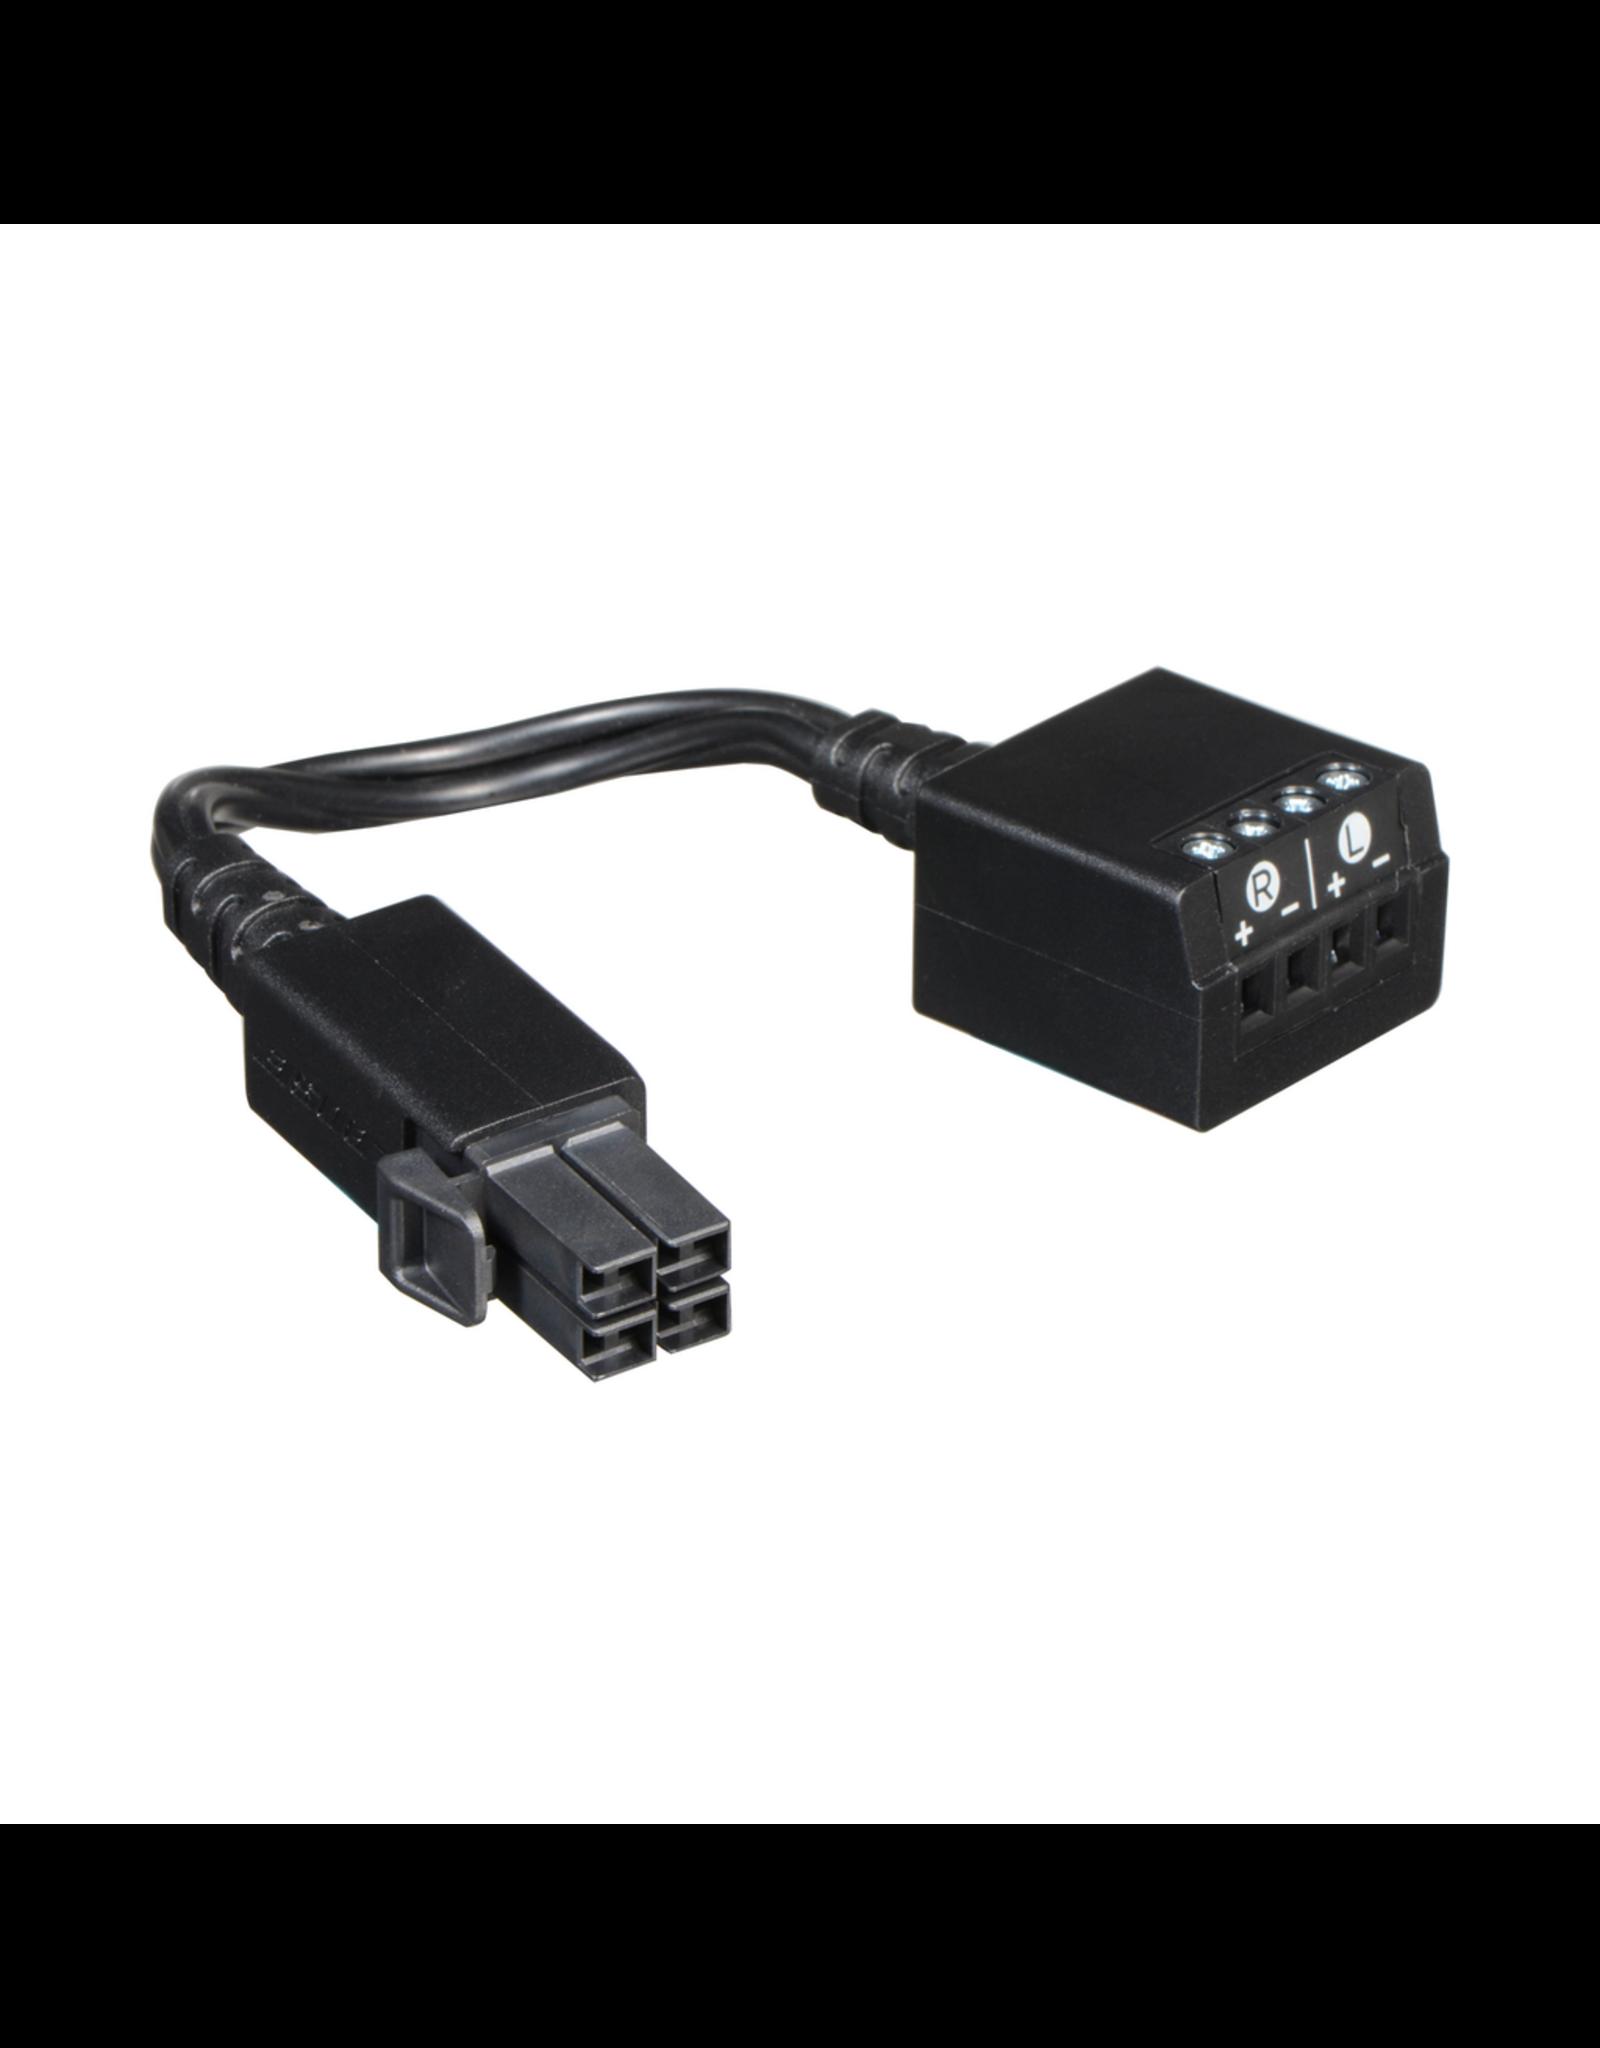 BOSE BOSE LS 600/650 Rear Speaker 4-pin Plug to Speaker Cable Adaptor